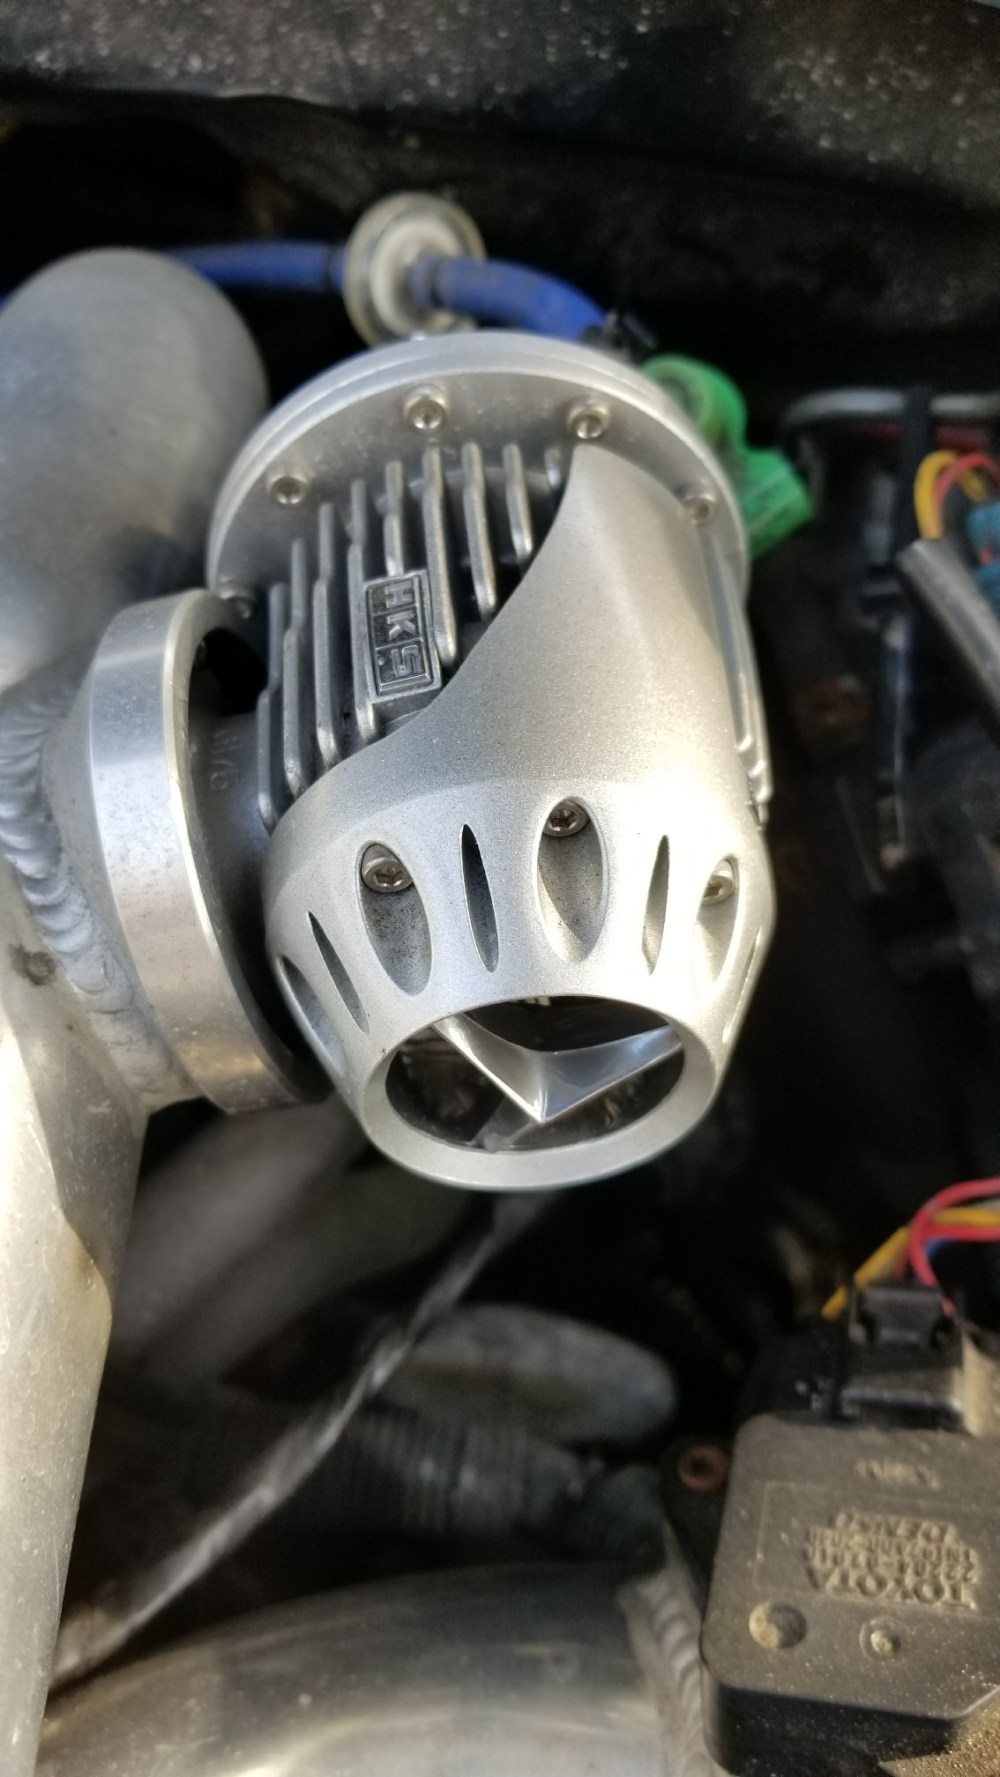 medium resolution of 2006 dezod turbo scion tc with lsd trans 20180121 112502 resized jpg